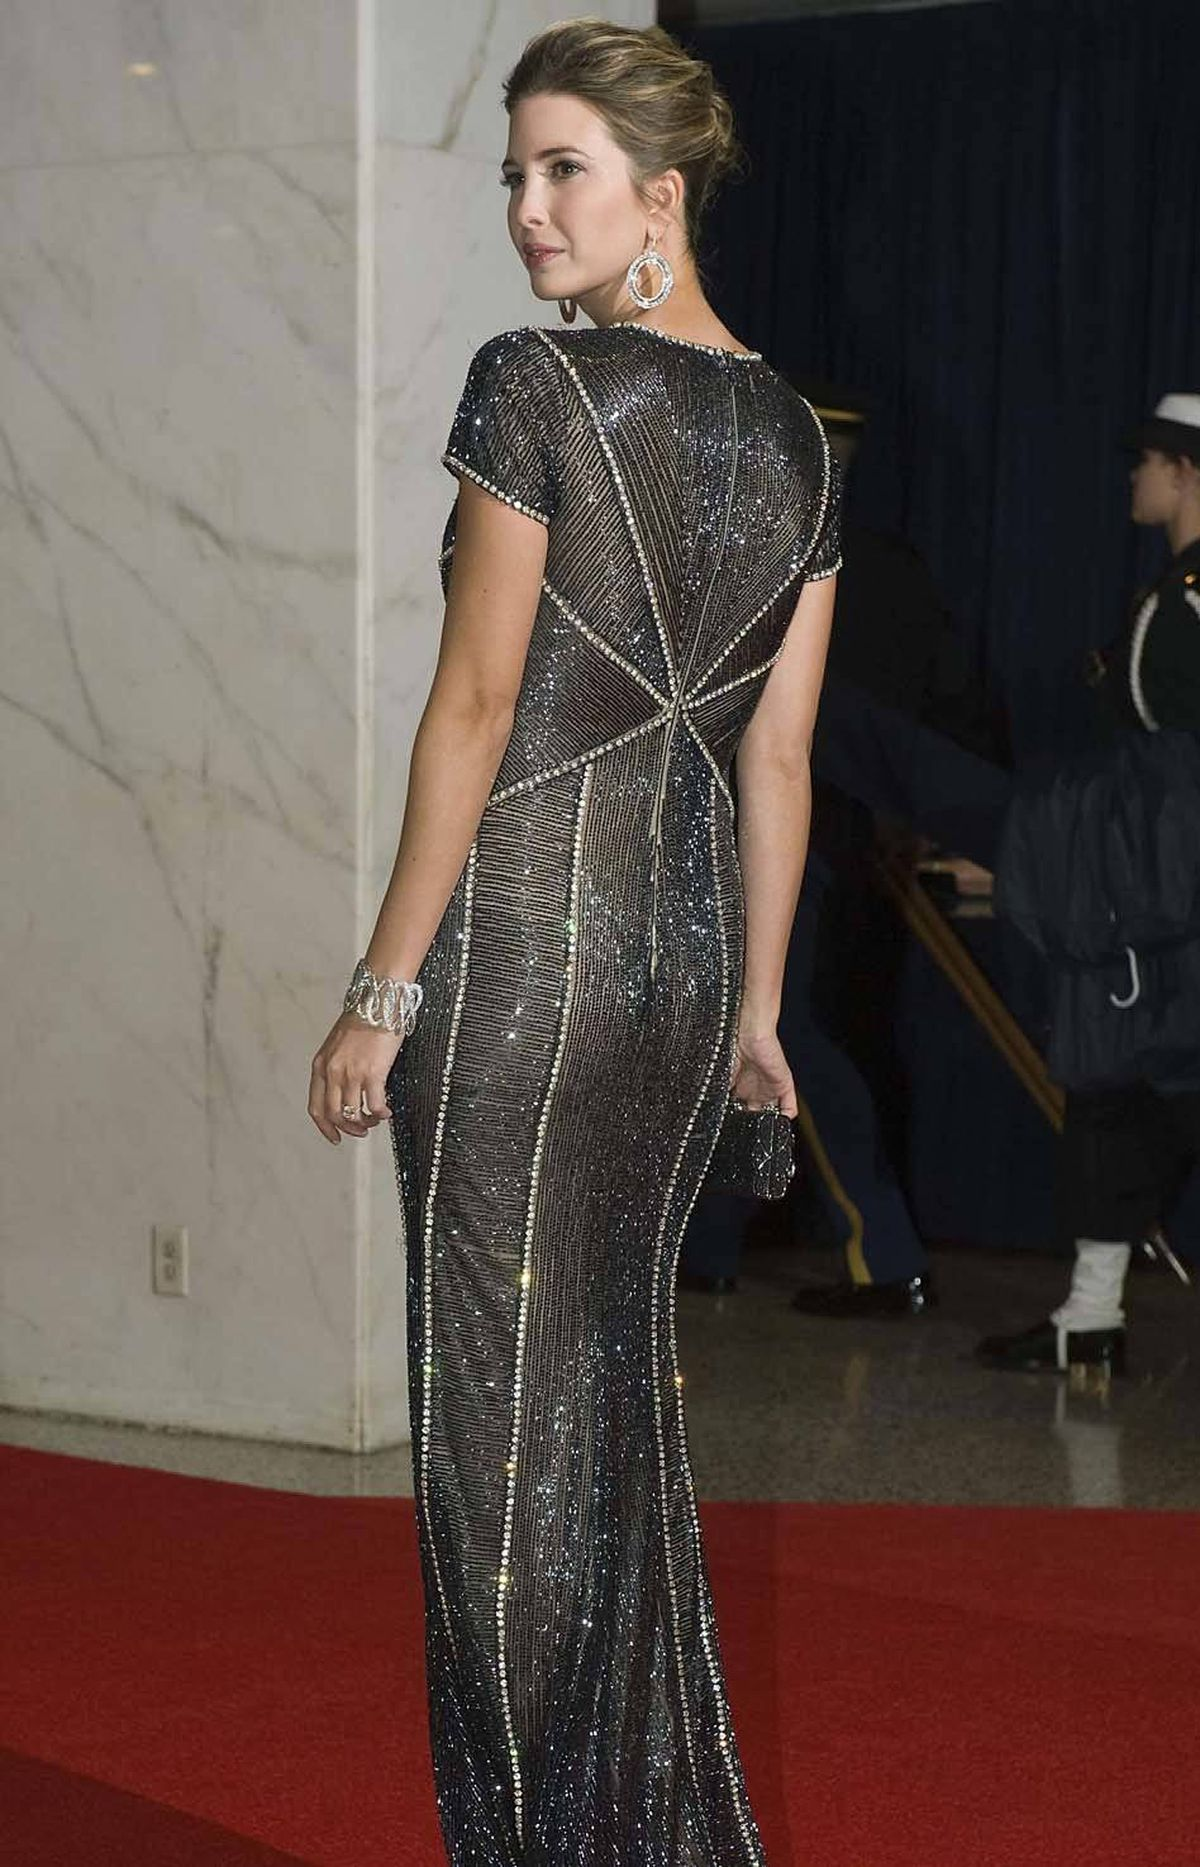 Socialite Ivanka Trump attended the annual White House Correspondents' Dinner at the Washington Hilton in Washington, D.C. on Saturday.